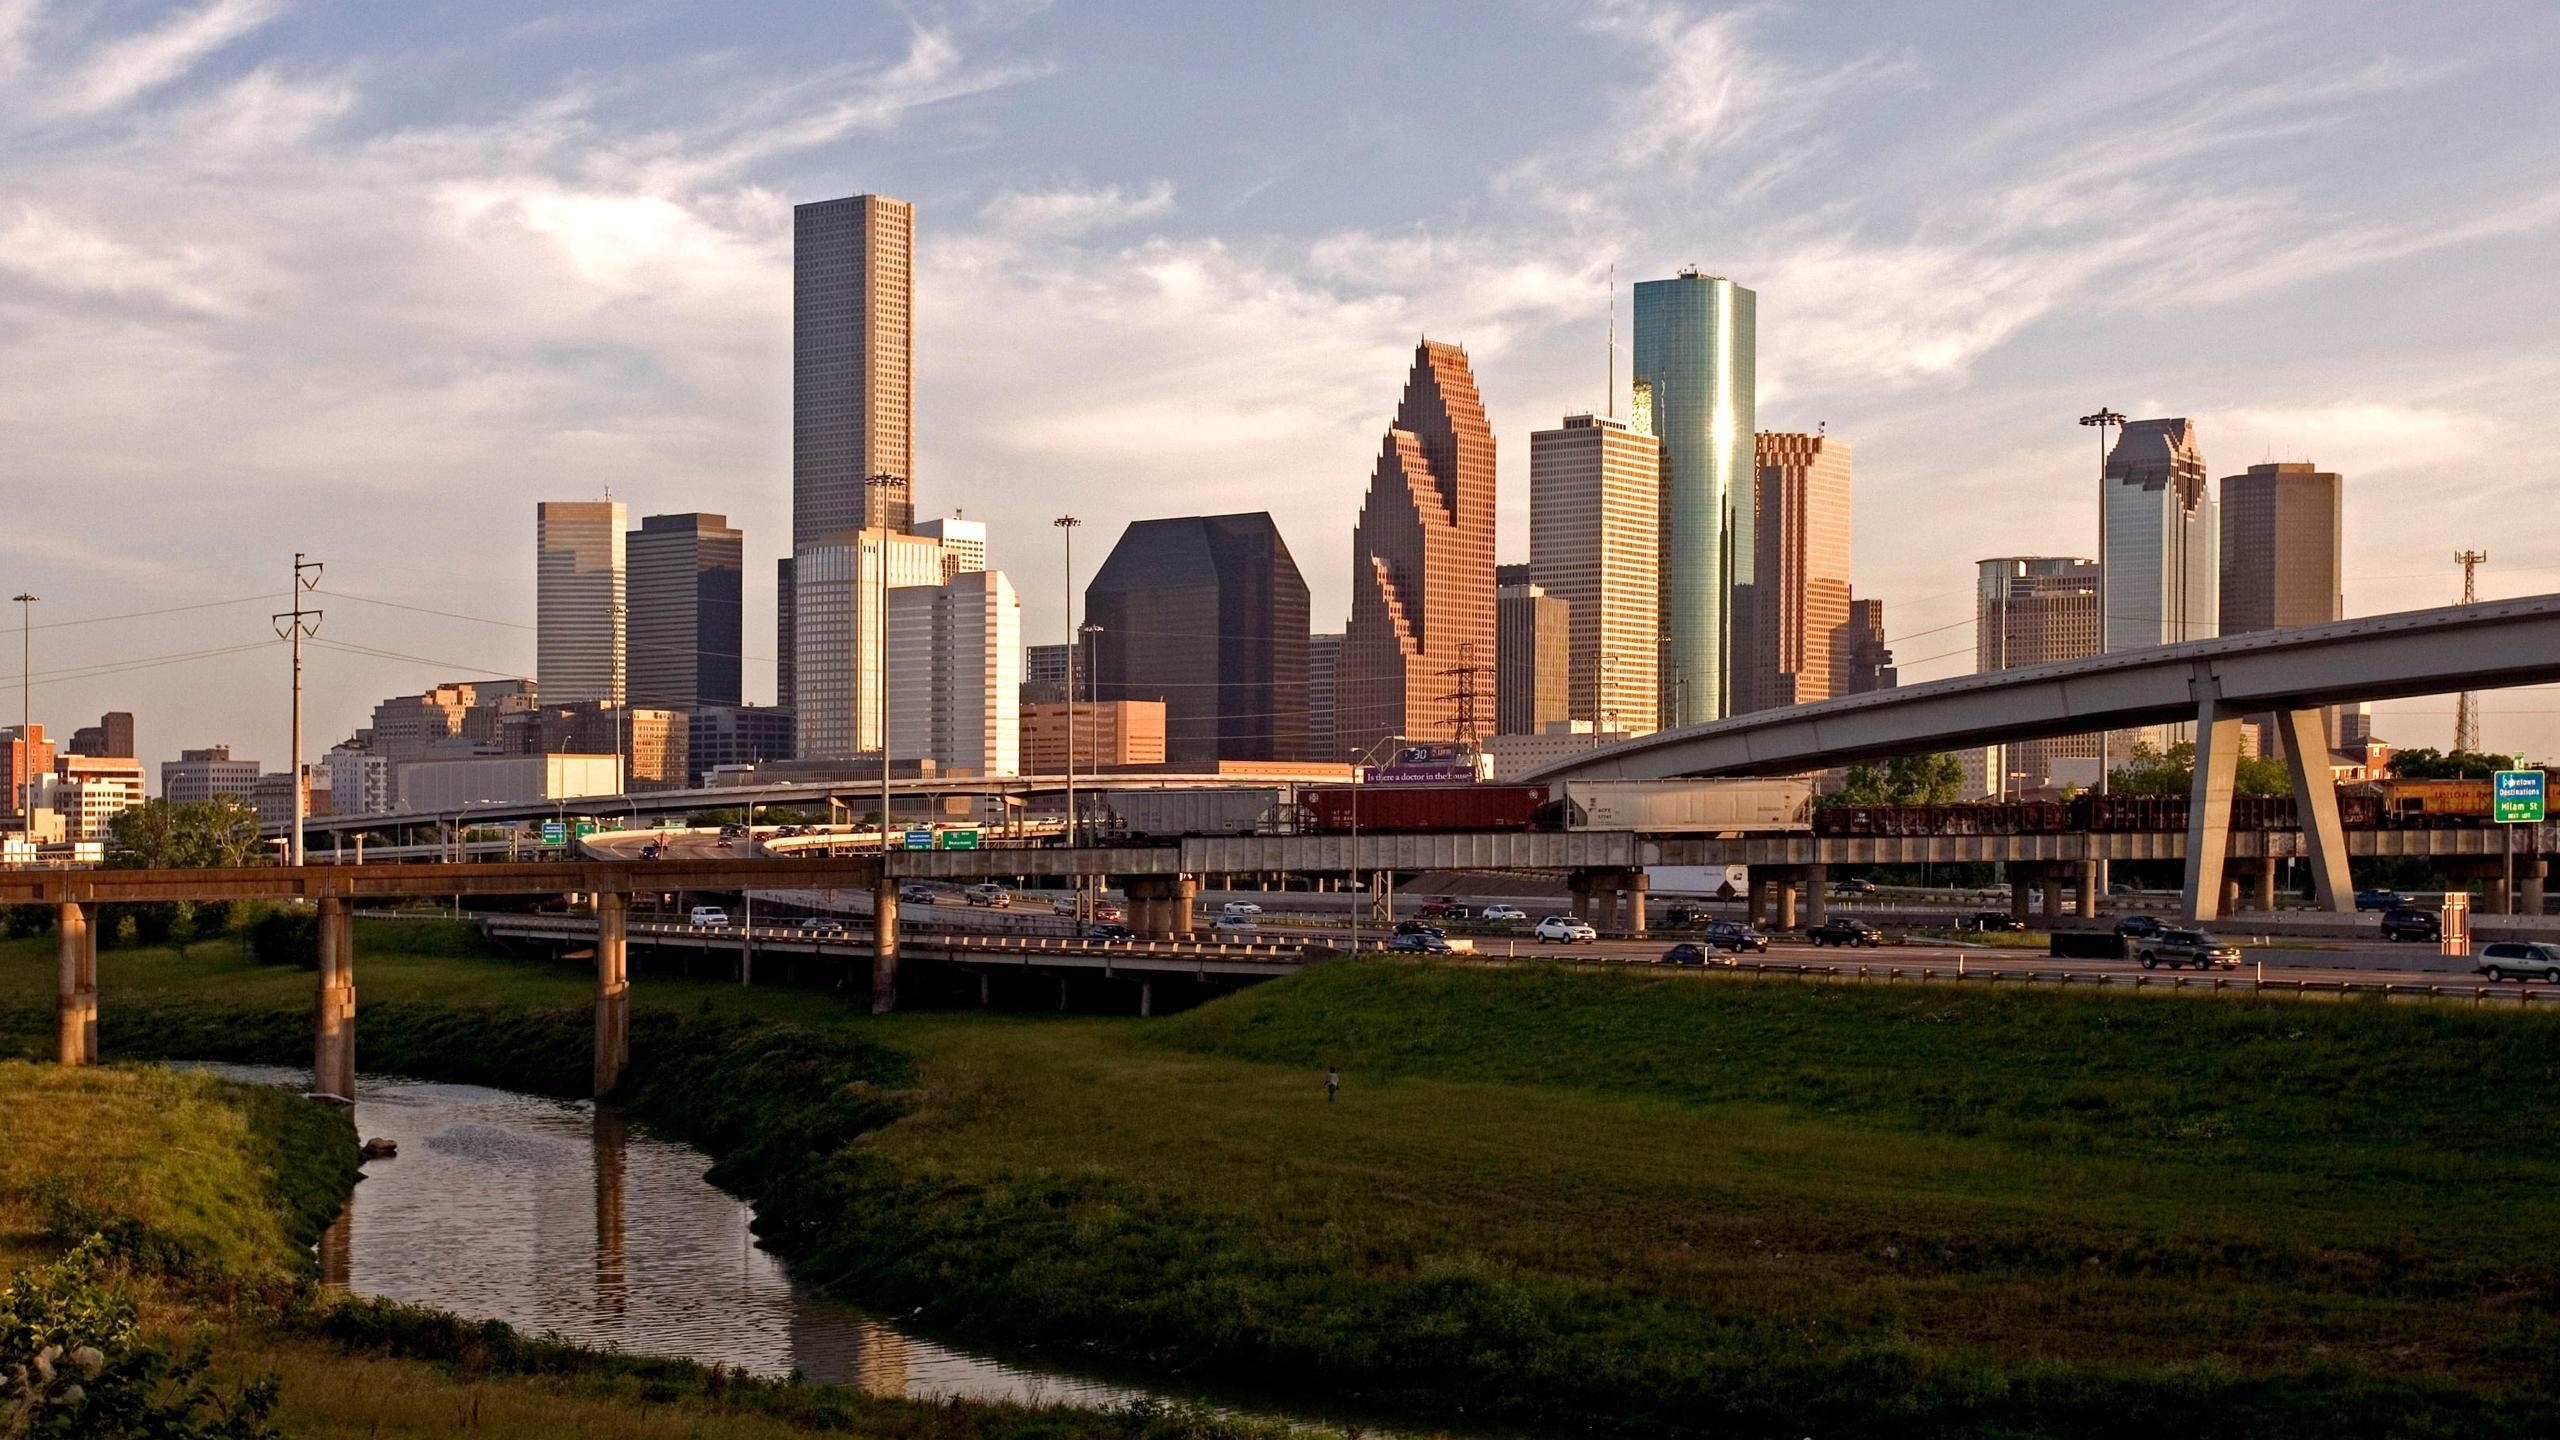 Fall Country Wallpaper Free Download Houston Skyline Backgrounds Pixelstalk Net